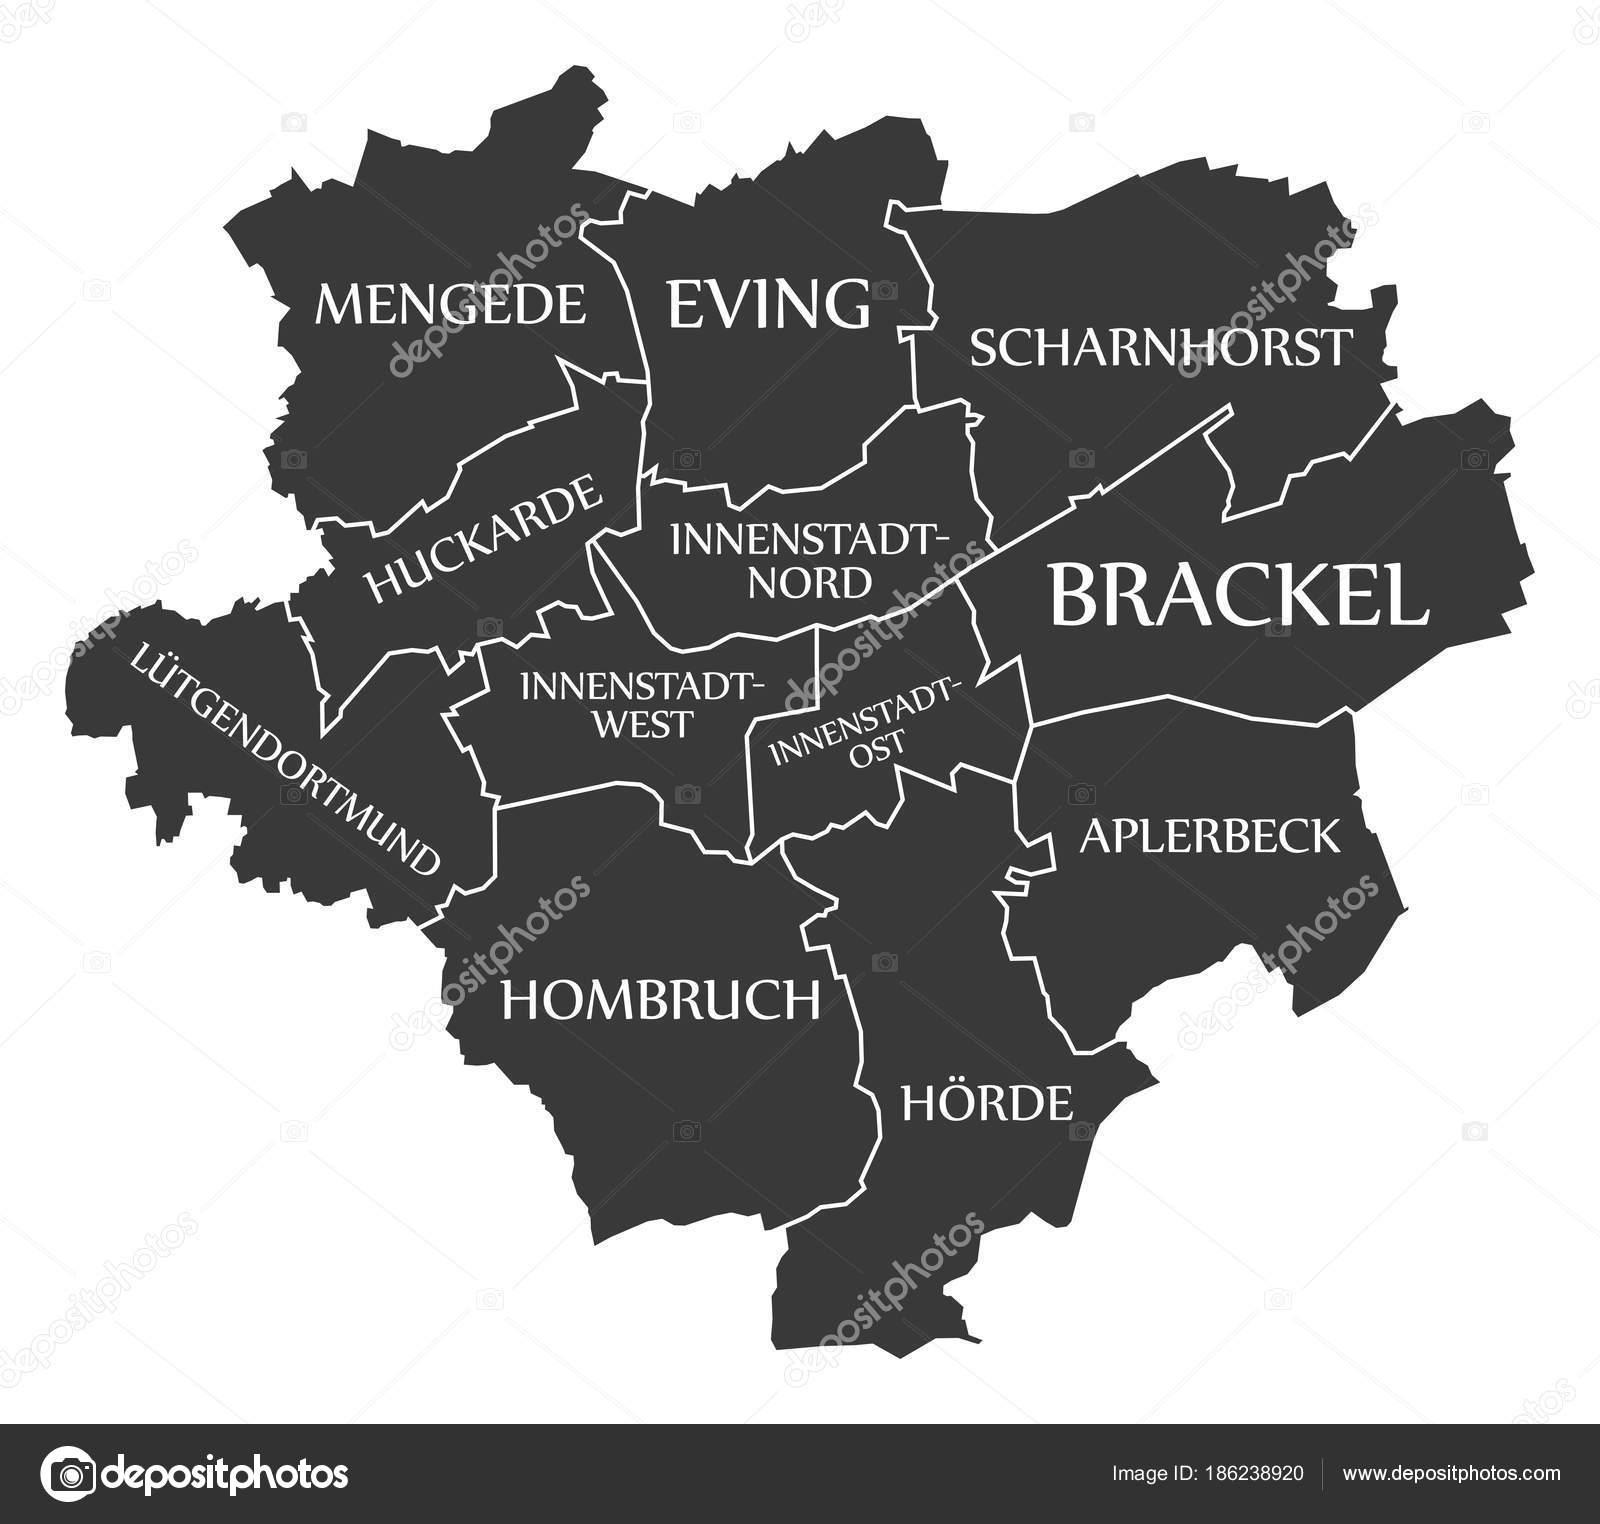 dortmund city map germany de labelled black illustration stock vector